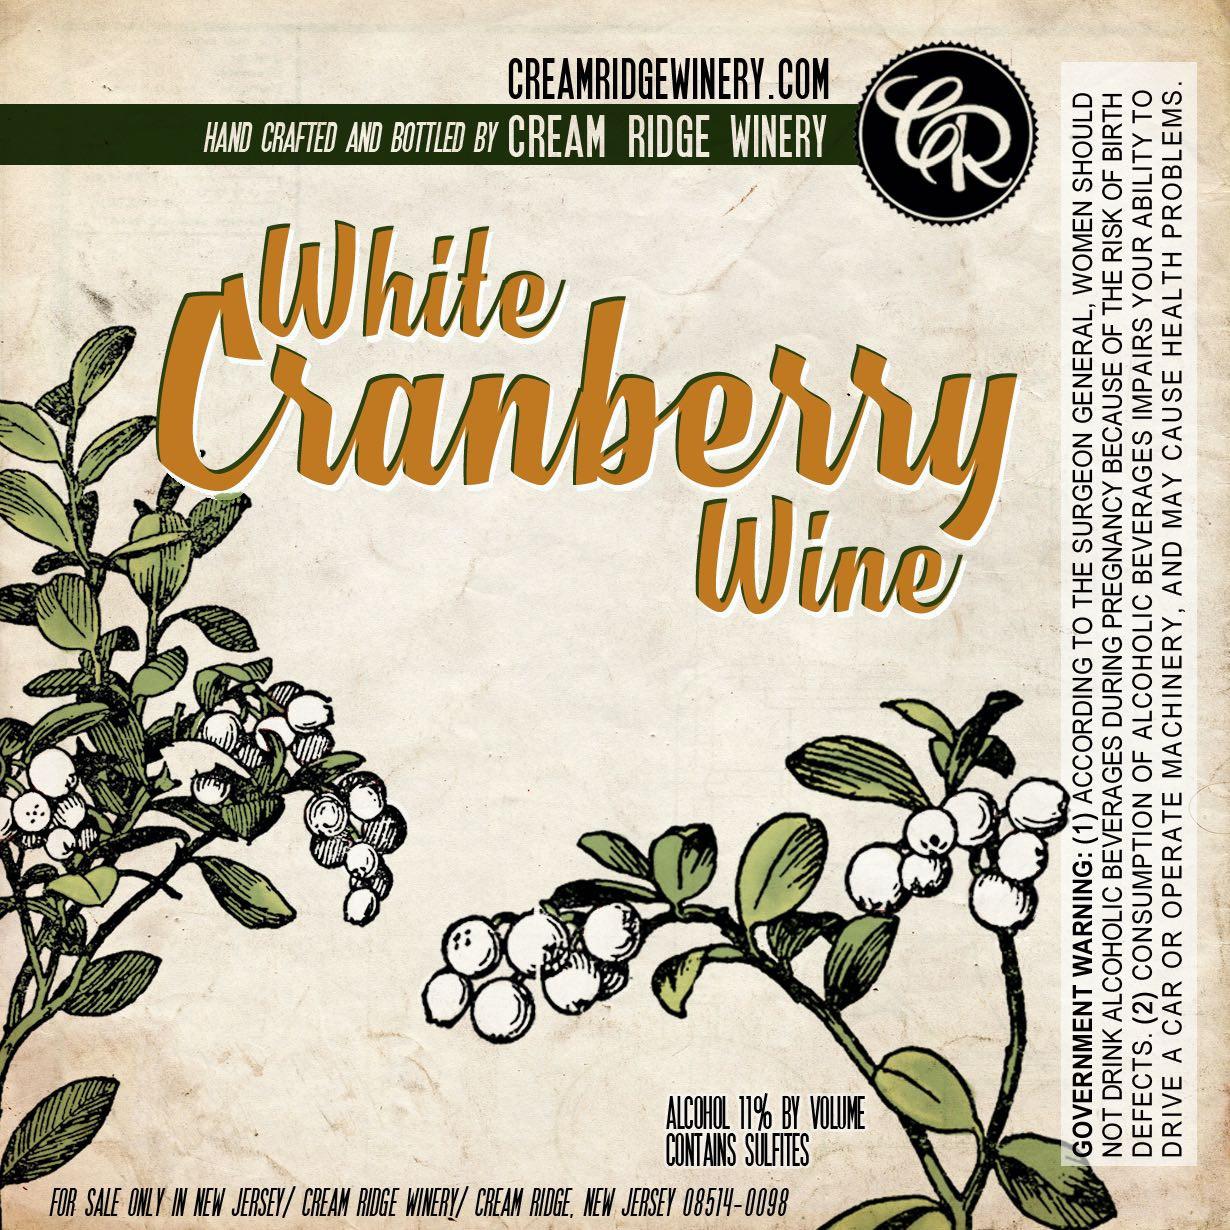 White Cranberry